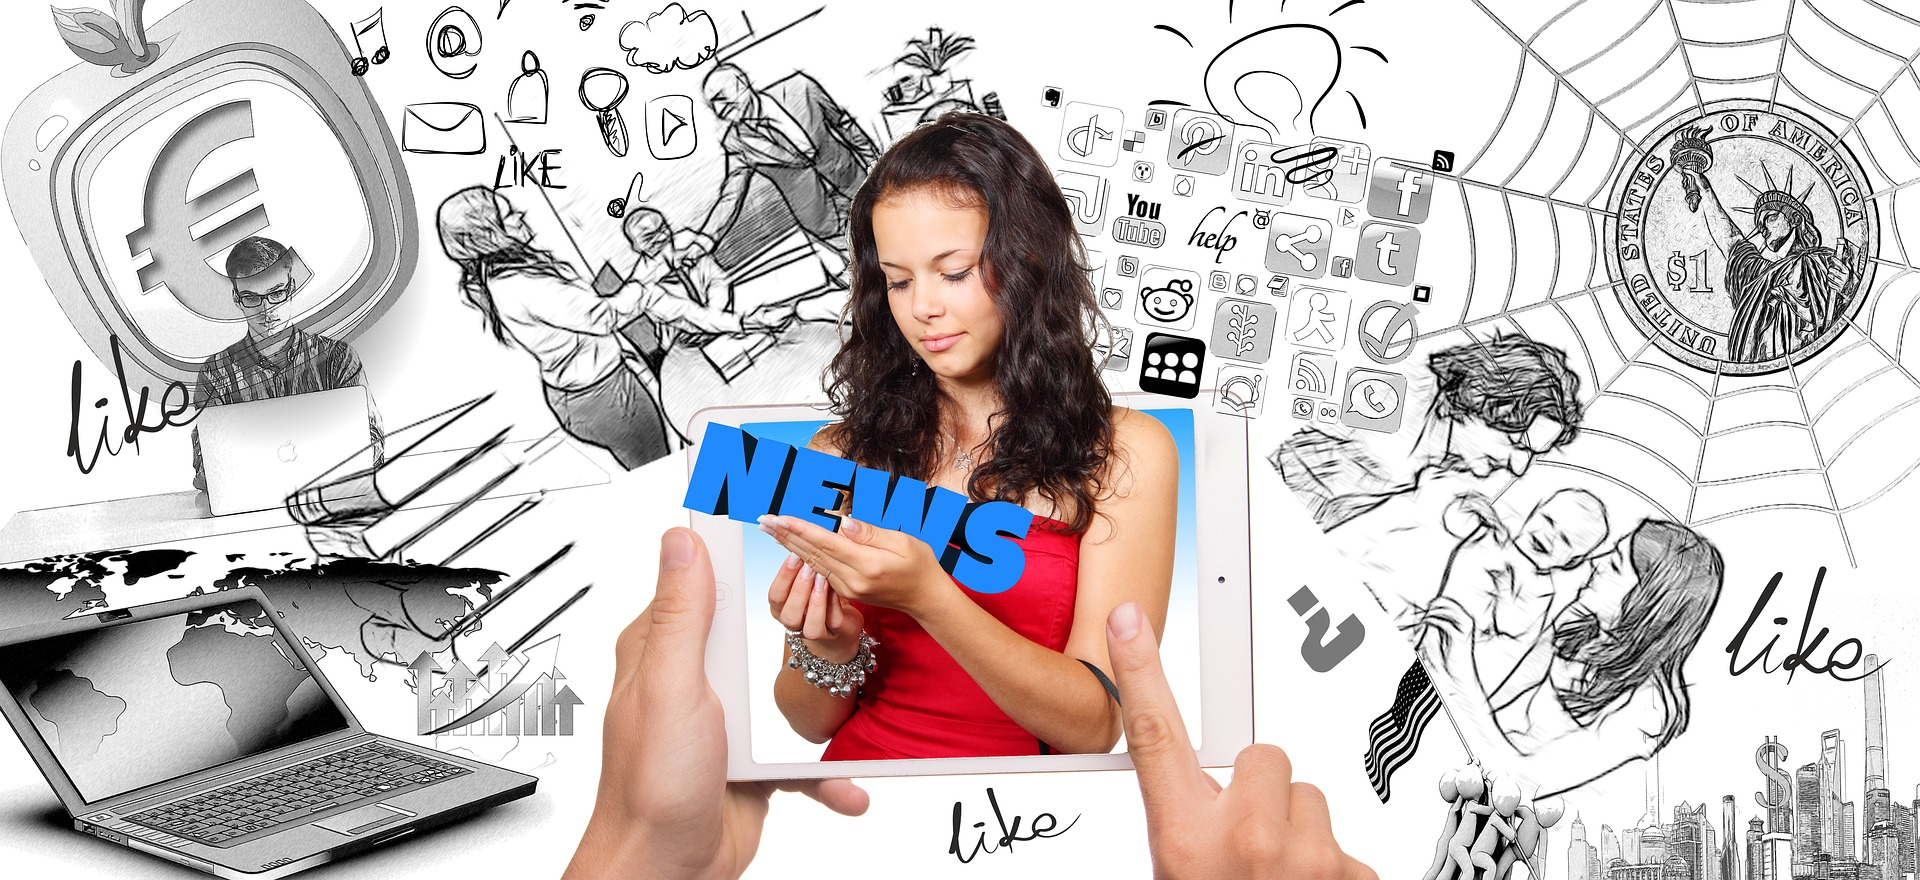 Soziale Netzwerke / Social Media